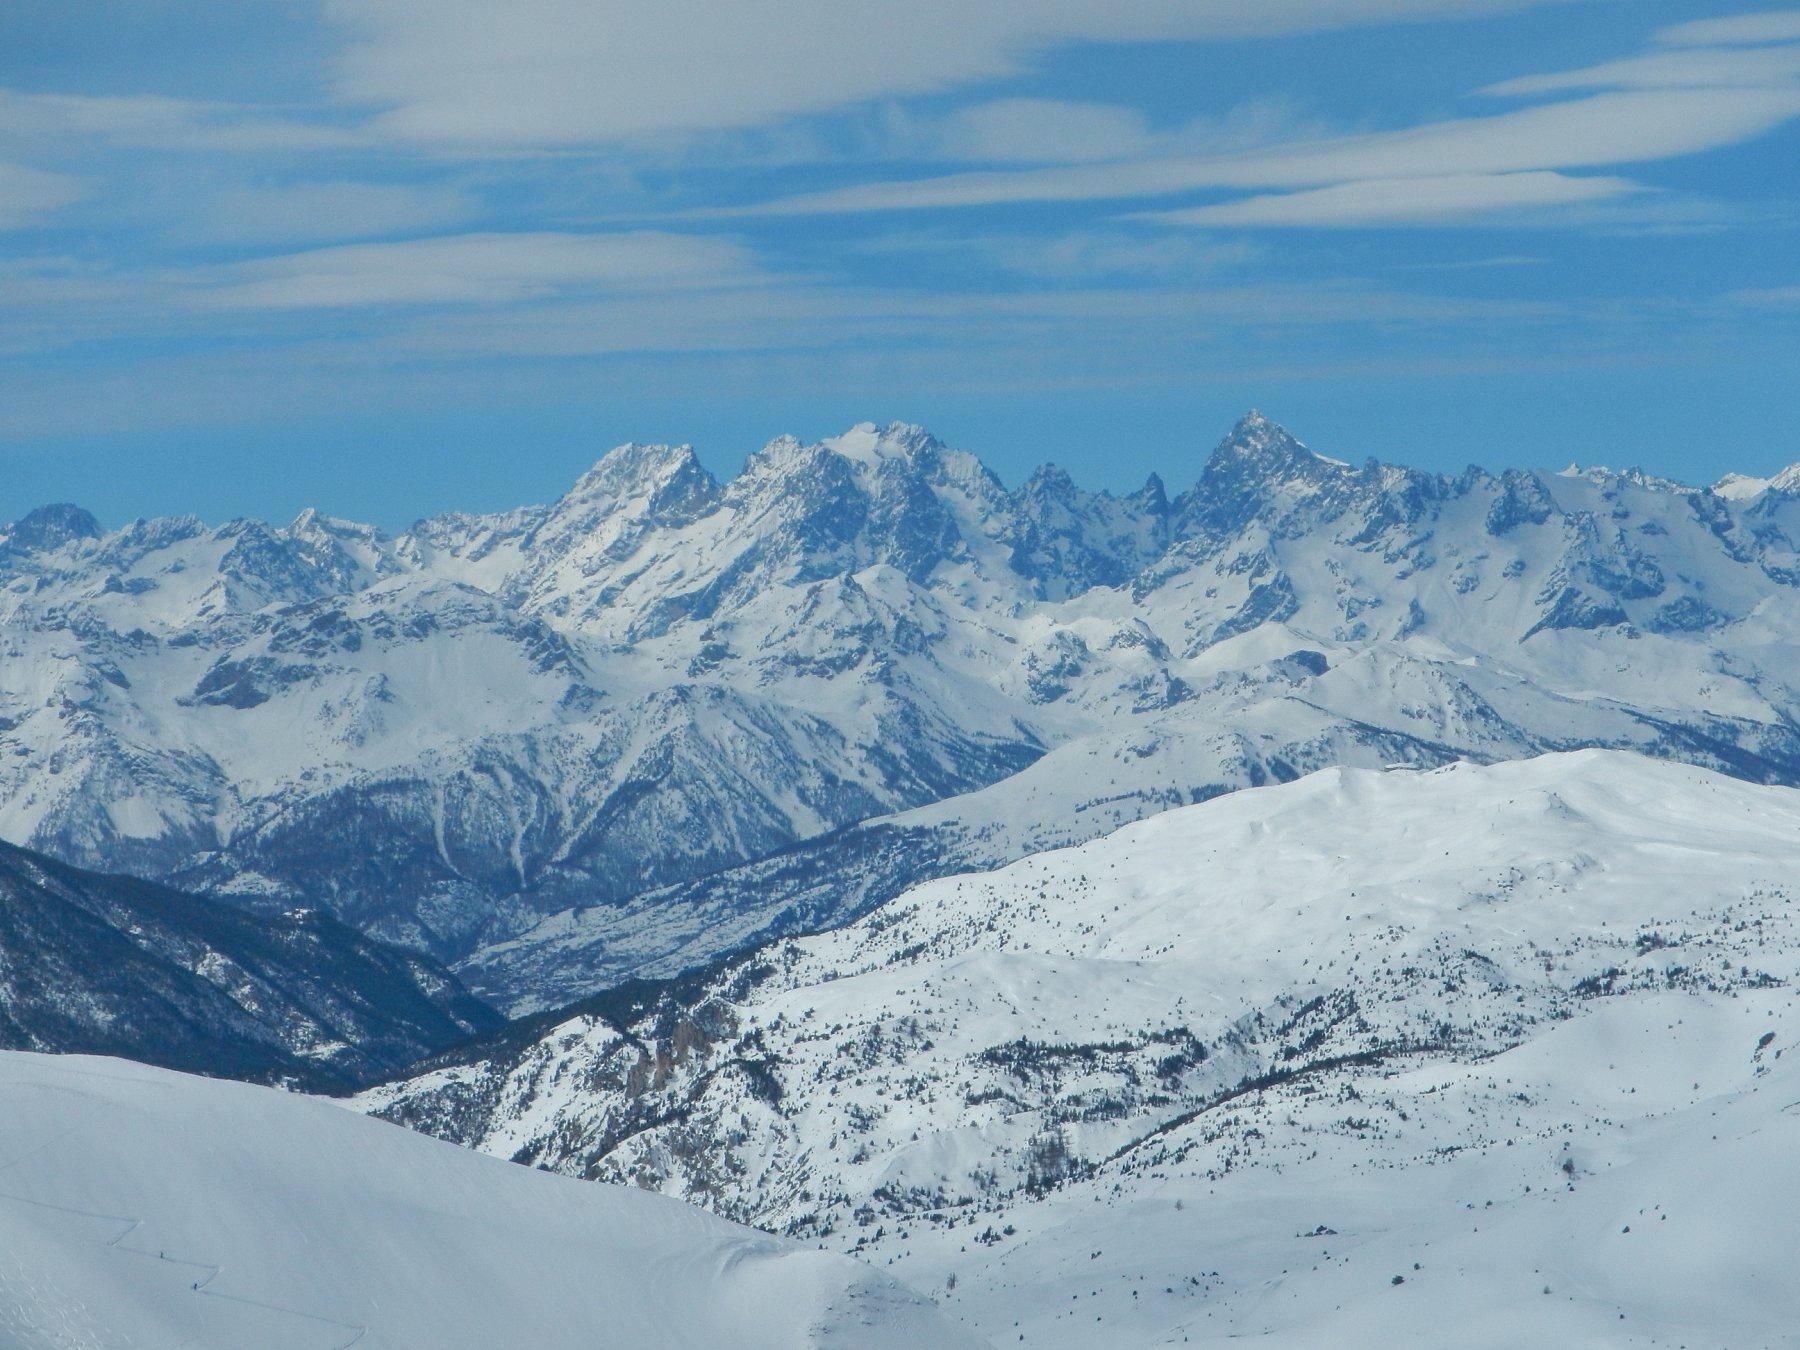 vista sul Monte Pelvoux e la Barre des Ecrins